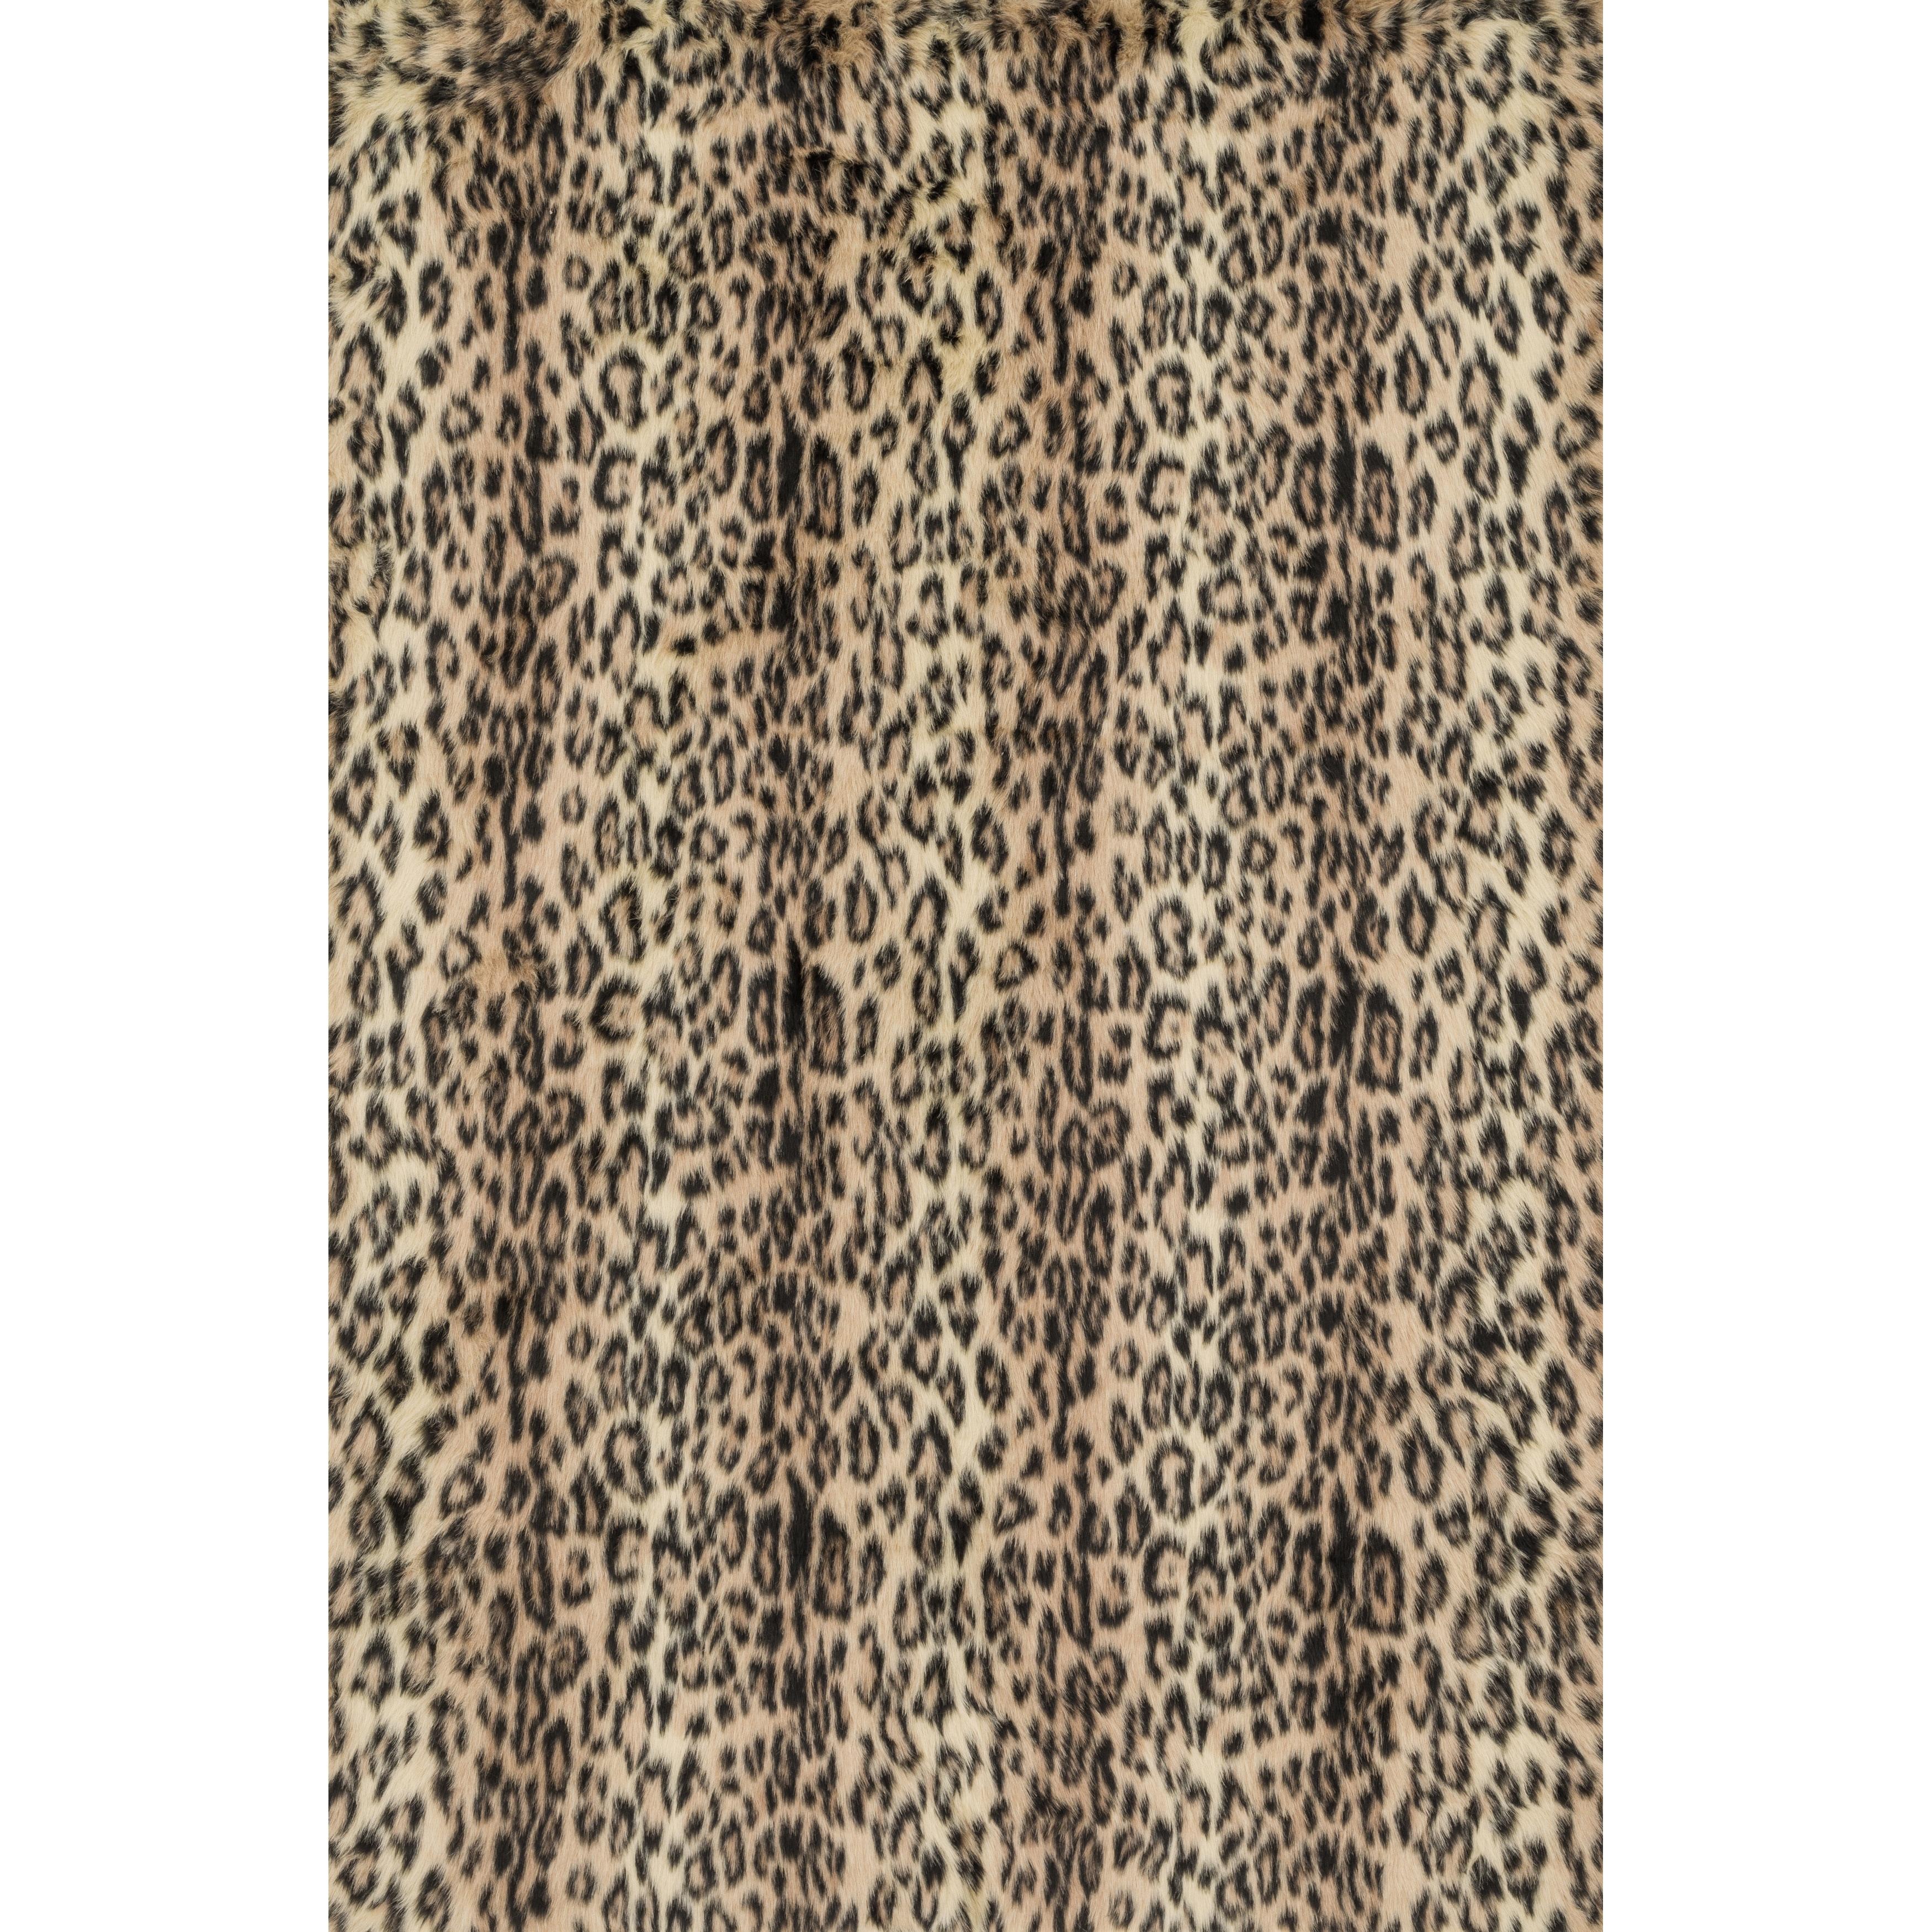 Alexander Home Jungle Cheetah Print Rug (5' x 7'6), Brown...